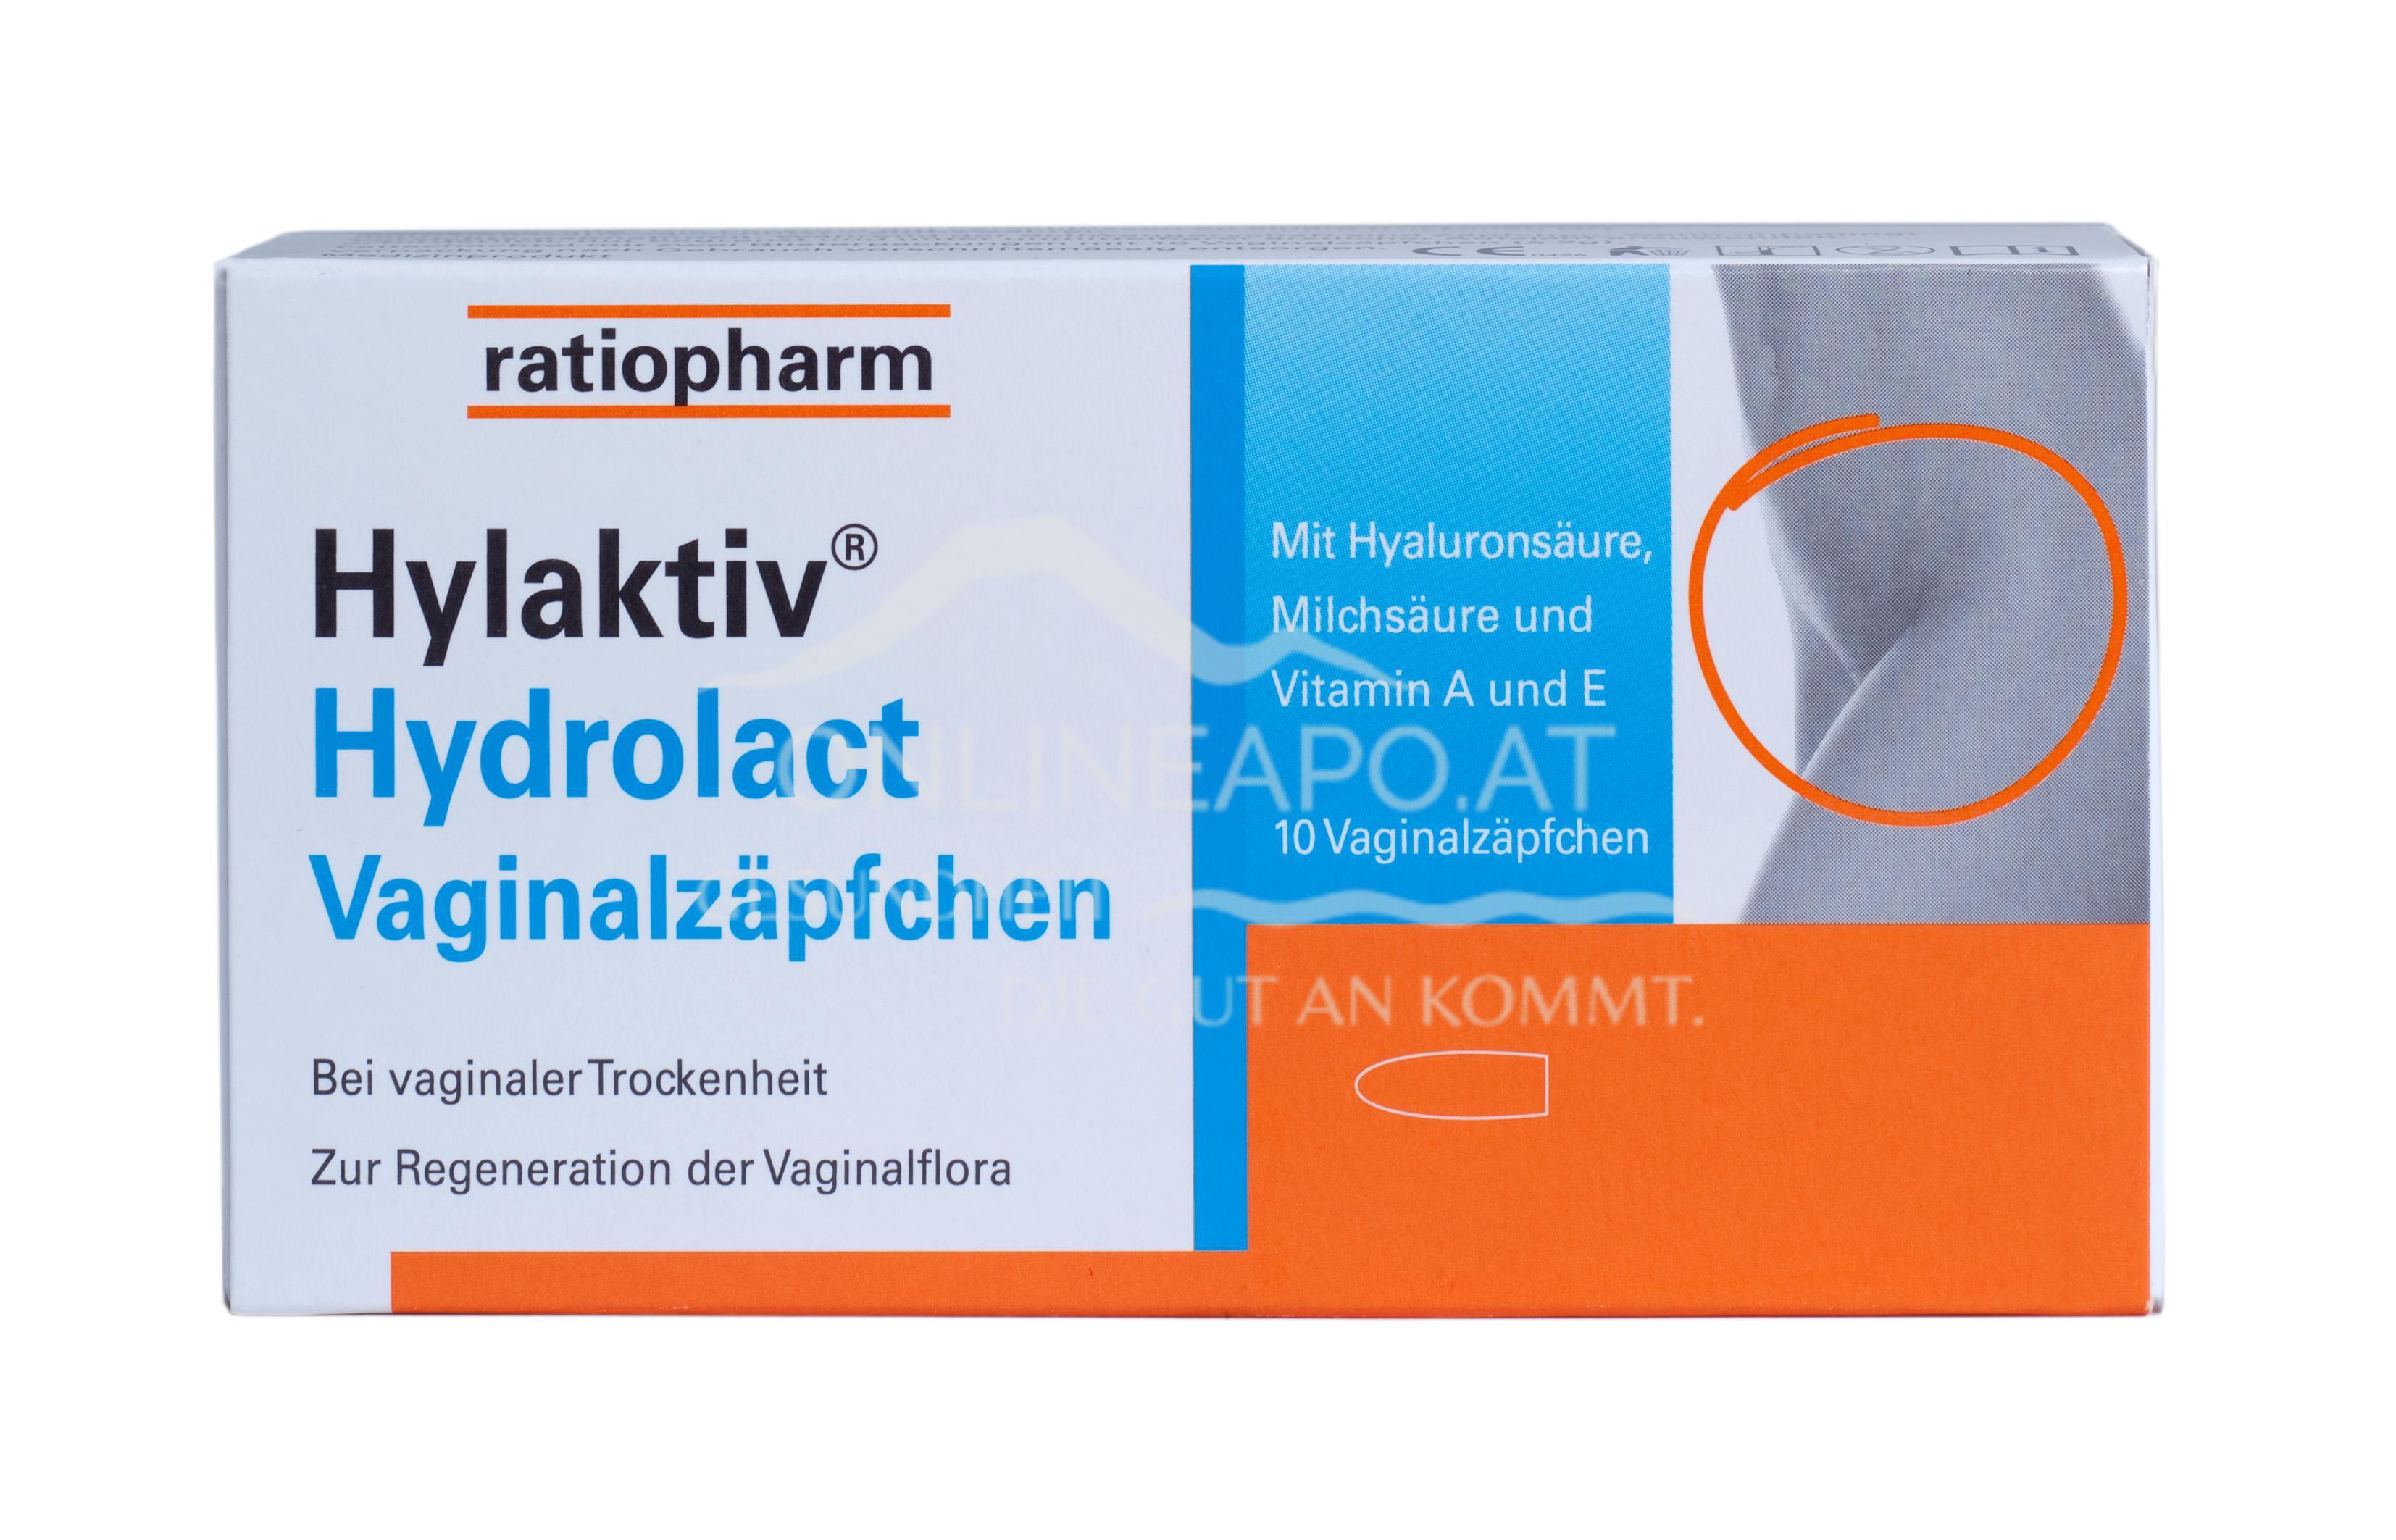 Hylaktiv®Hydrolact Vaginalzäpfchen